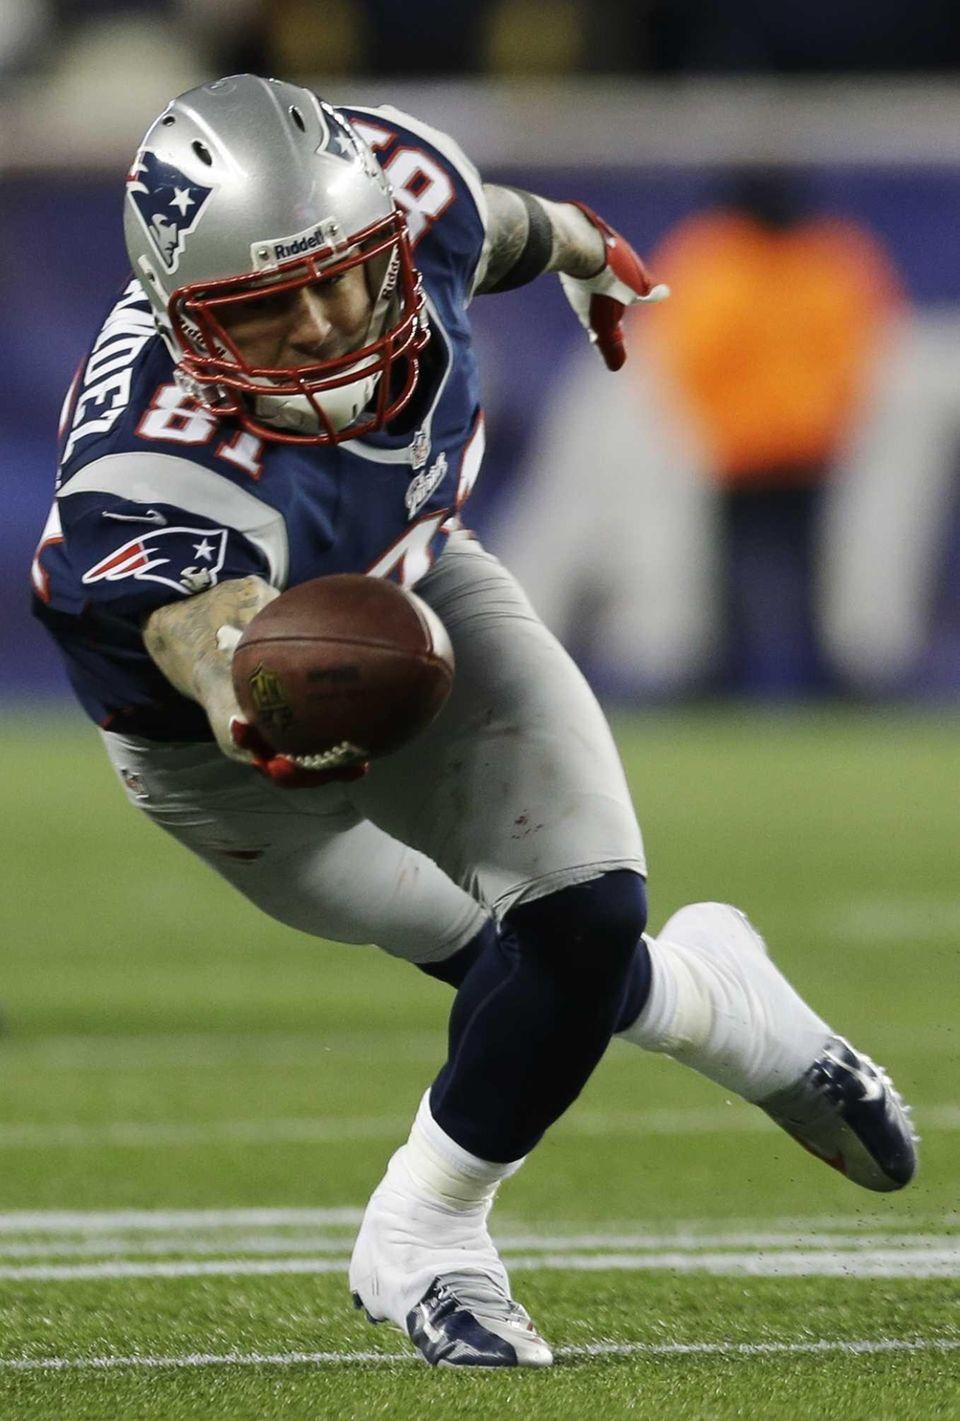 New England Patriots tight end Aaron Hernandez dives